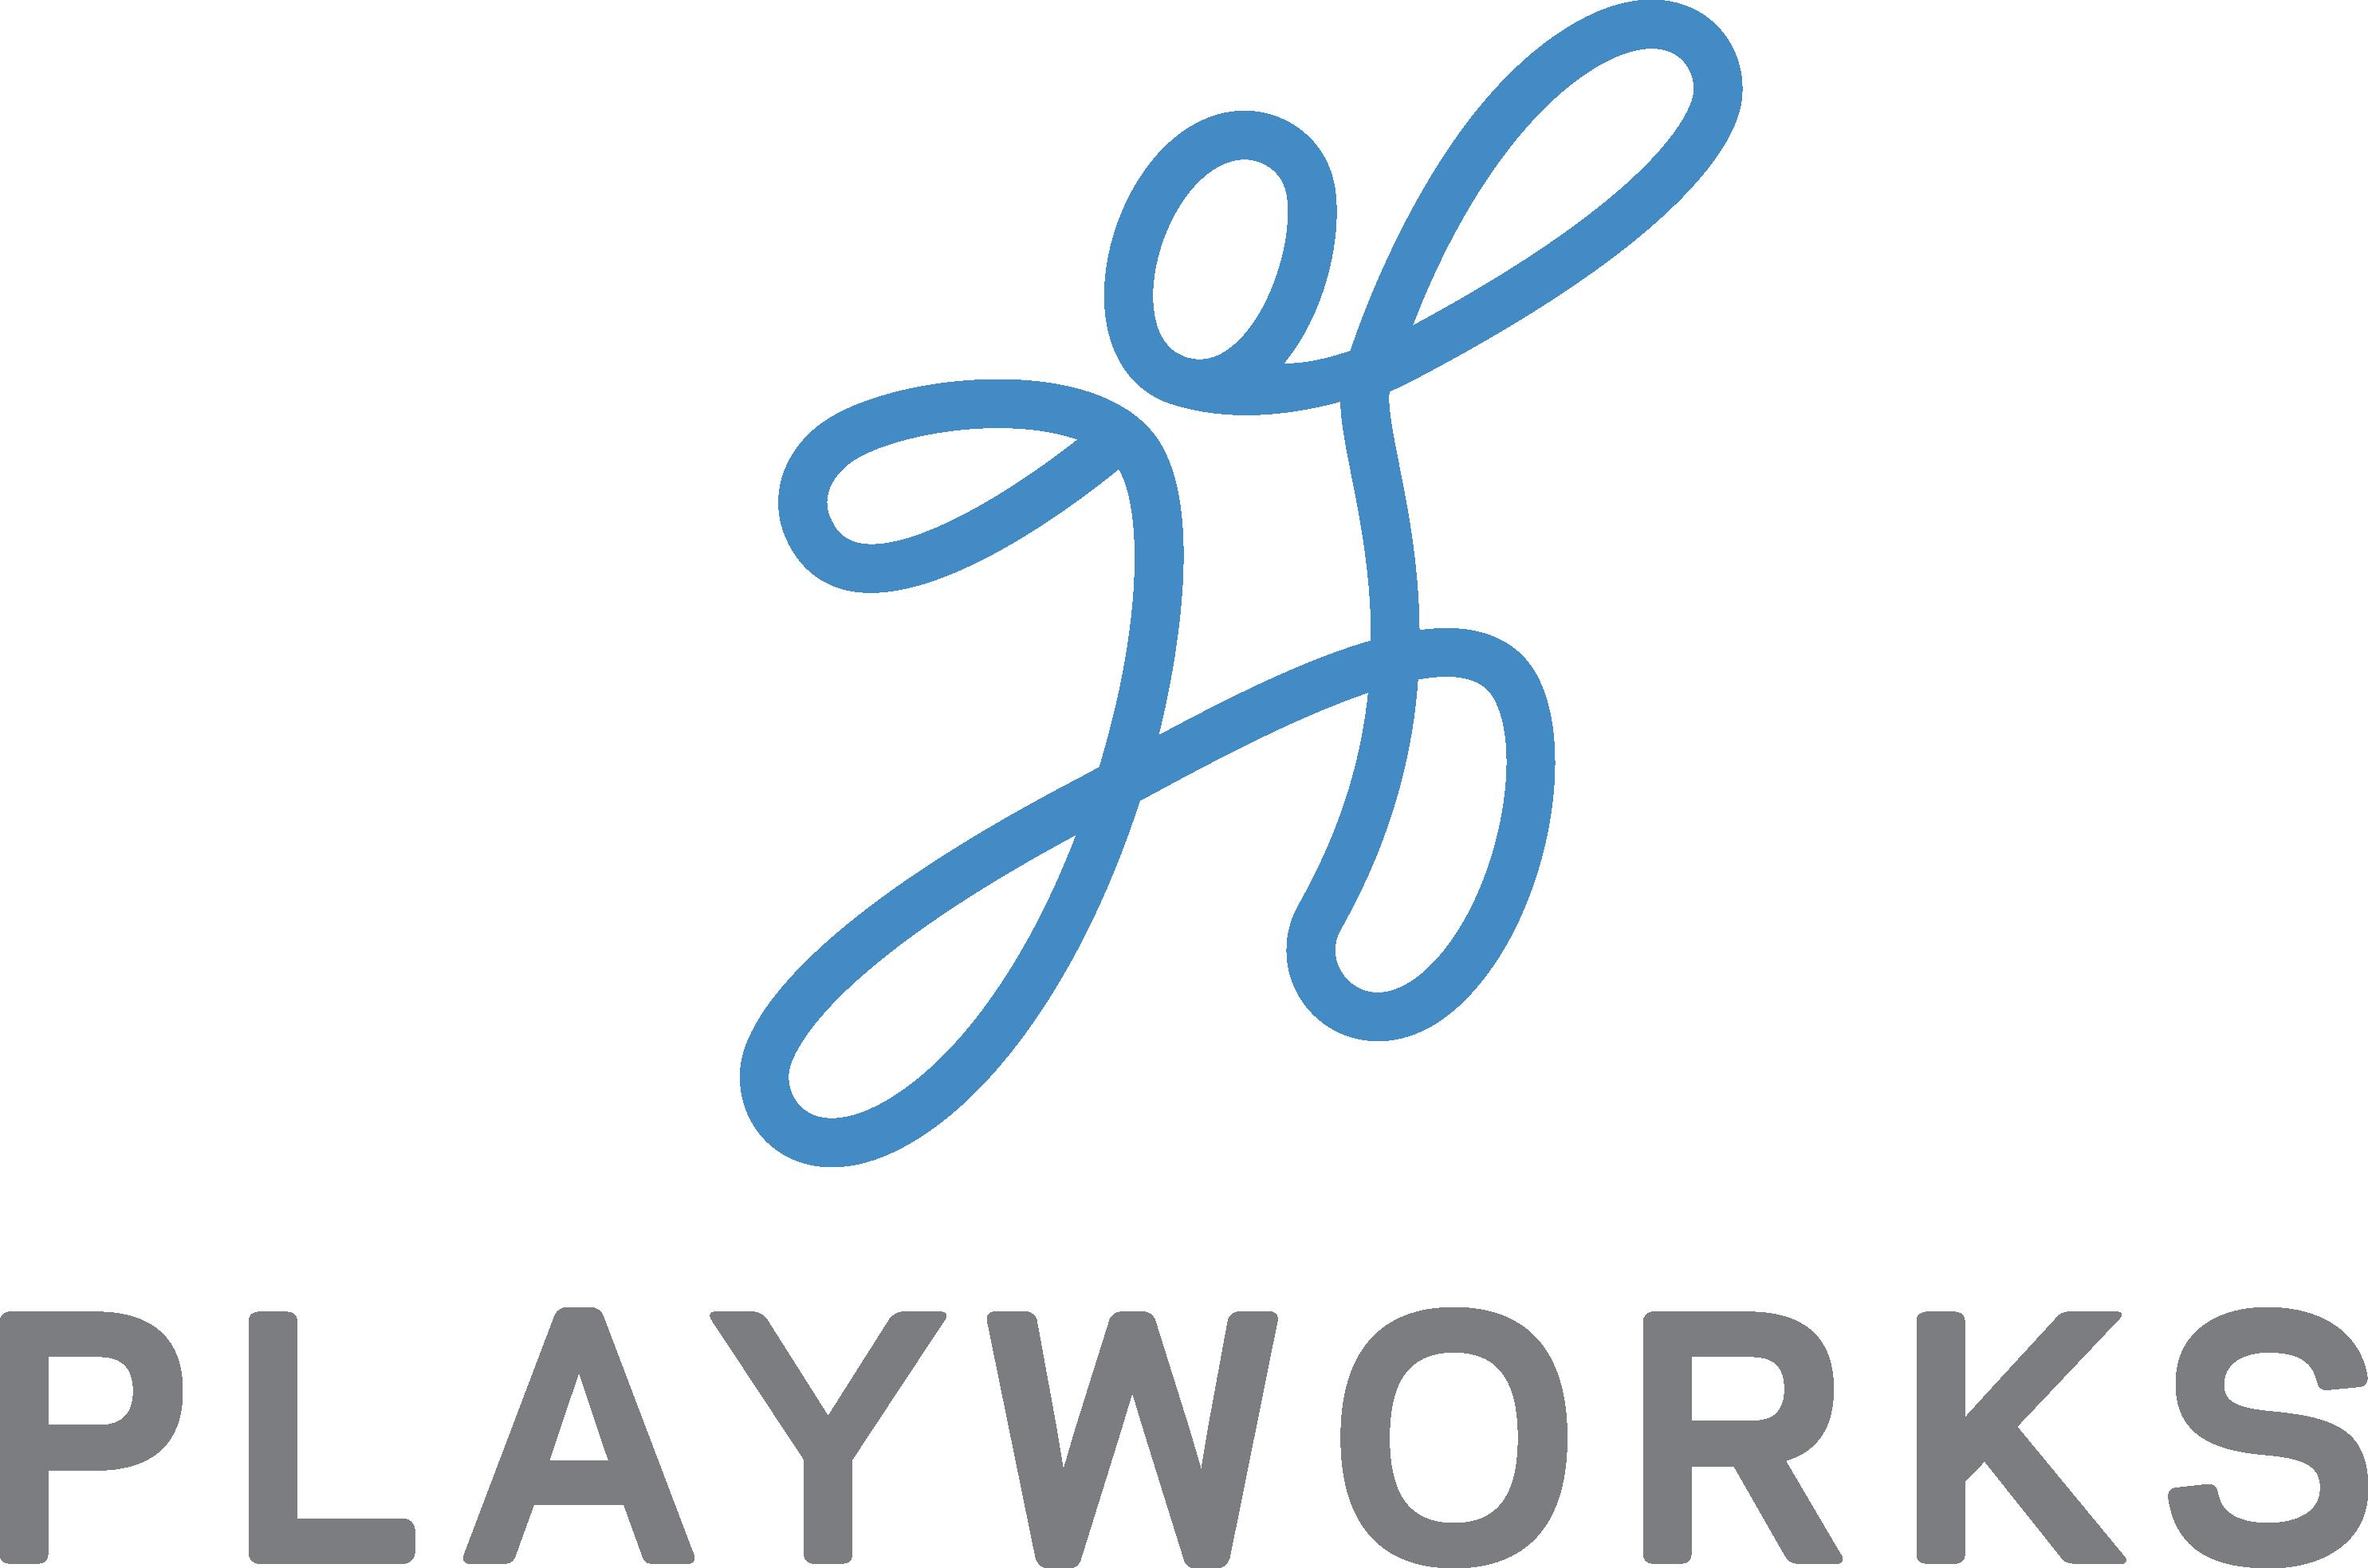 A logo of Playworks.